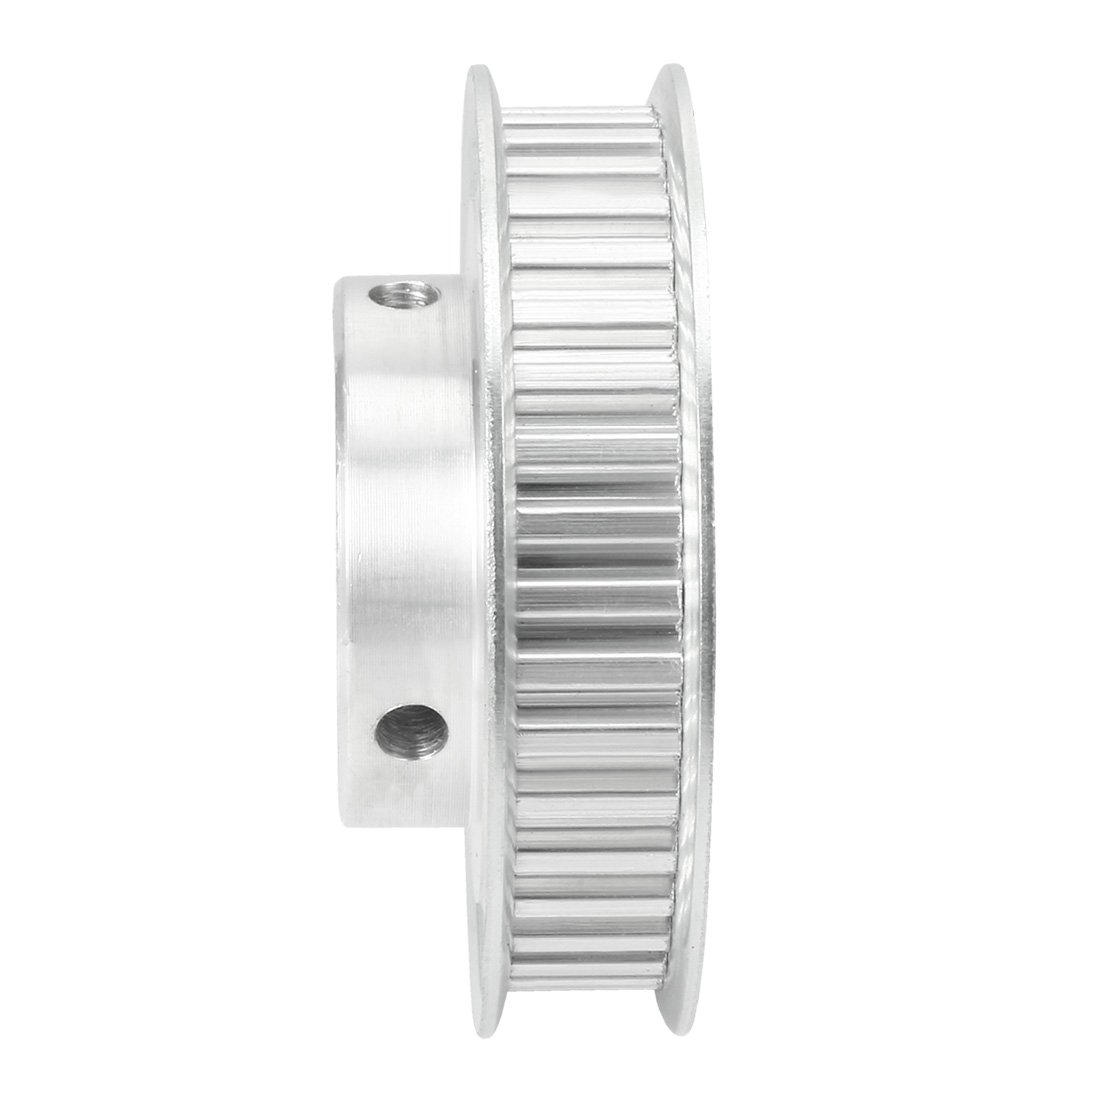 sourcingmap 11mm Breit G/ürtel Synchronrad XL 40 Zahn 10mm Bohrung Aluminium Zahnriemenscheibe DE